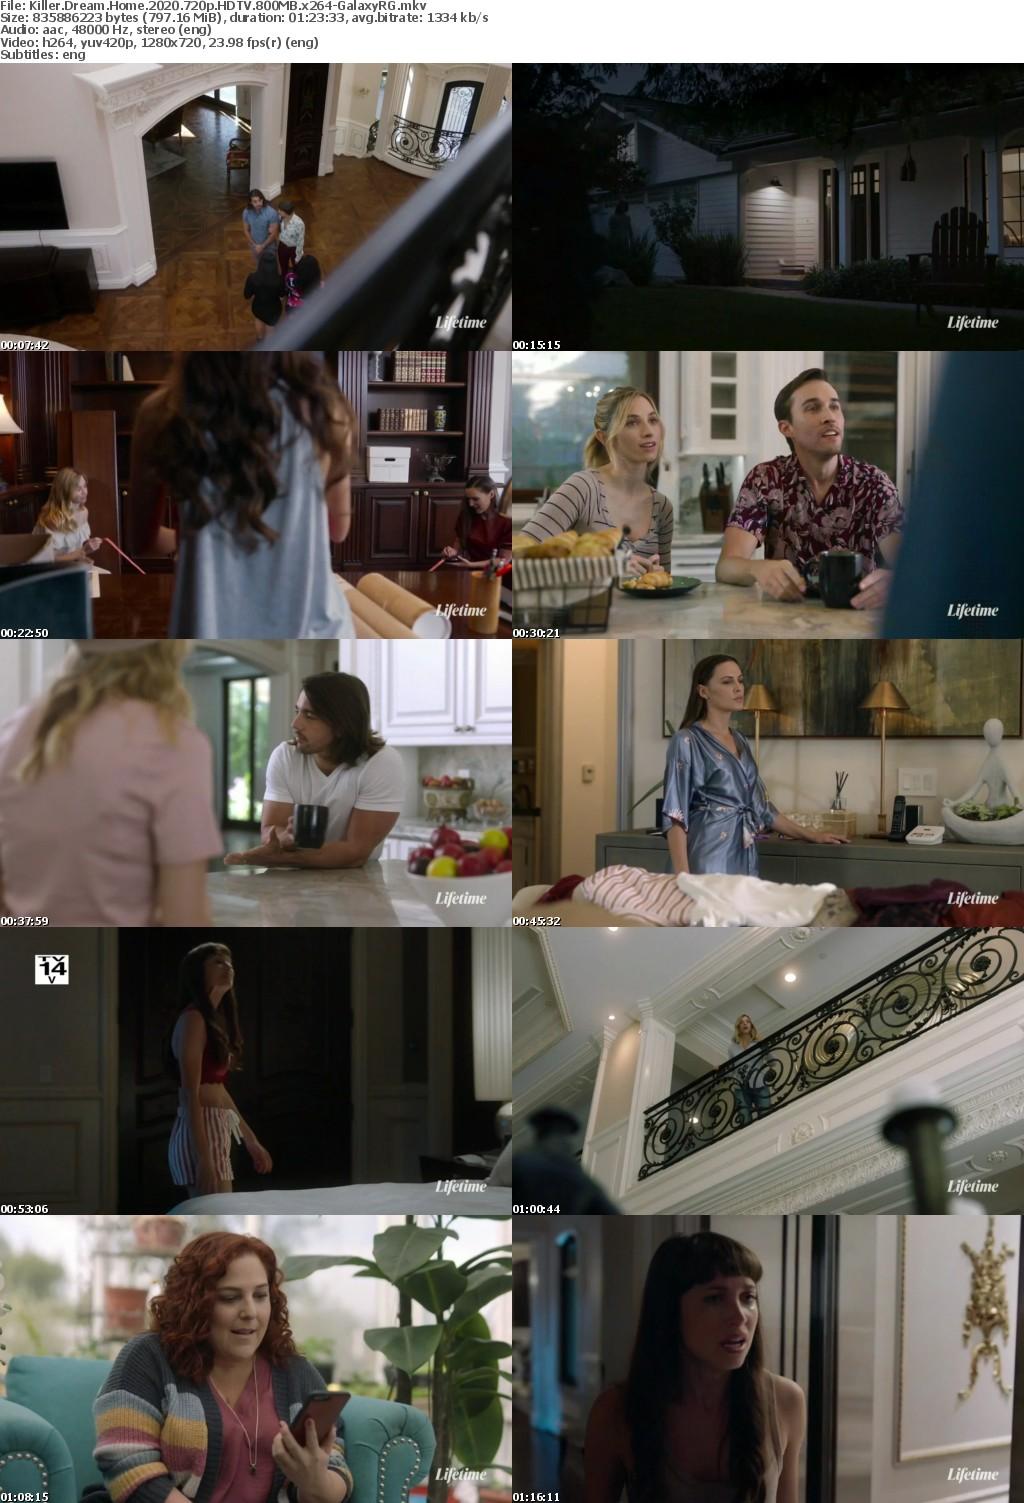 Killer Dream Home (2020) 720p HDTV 800MB x264-GalaxyRG